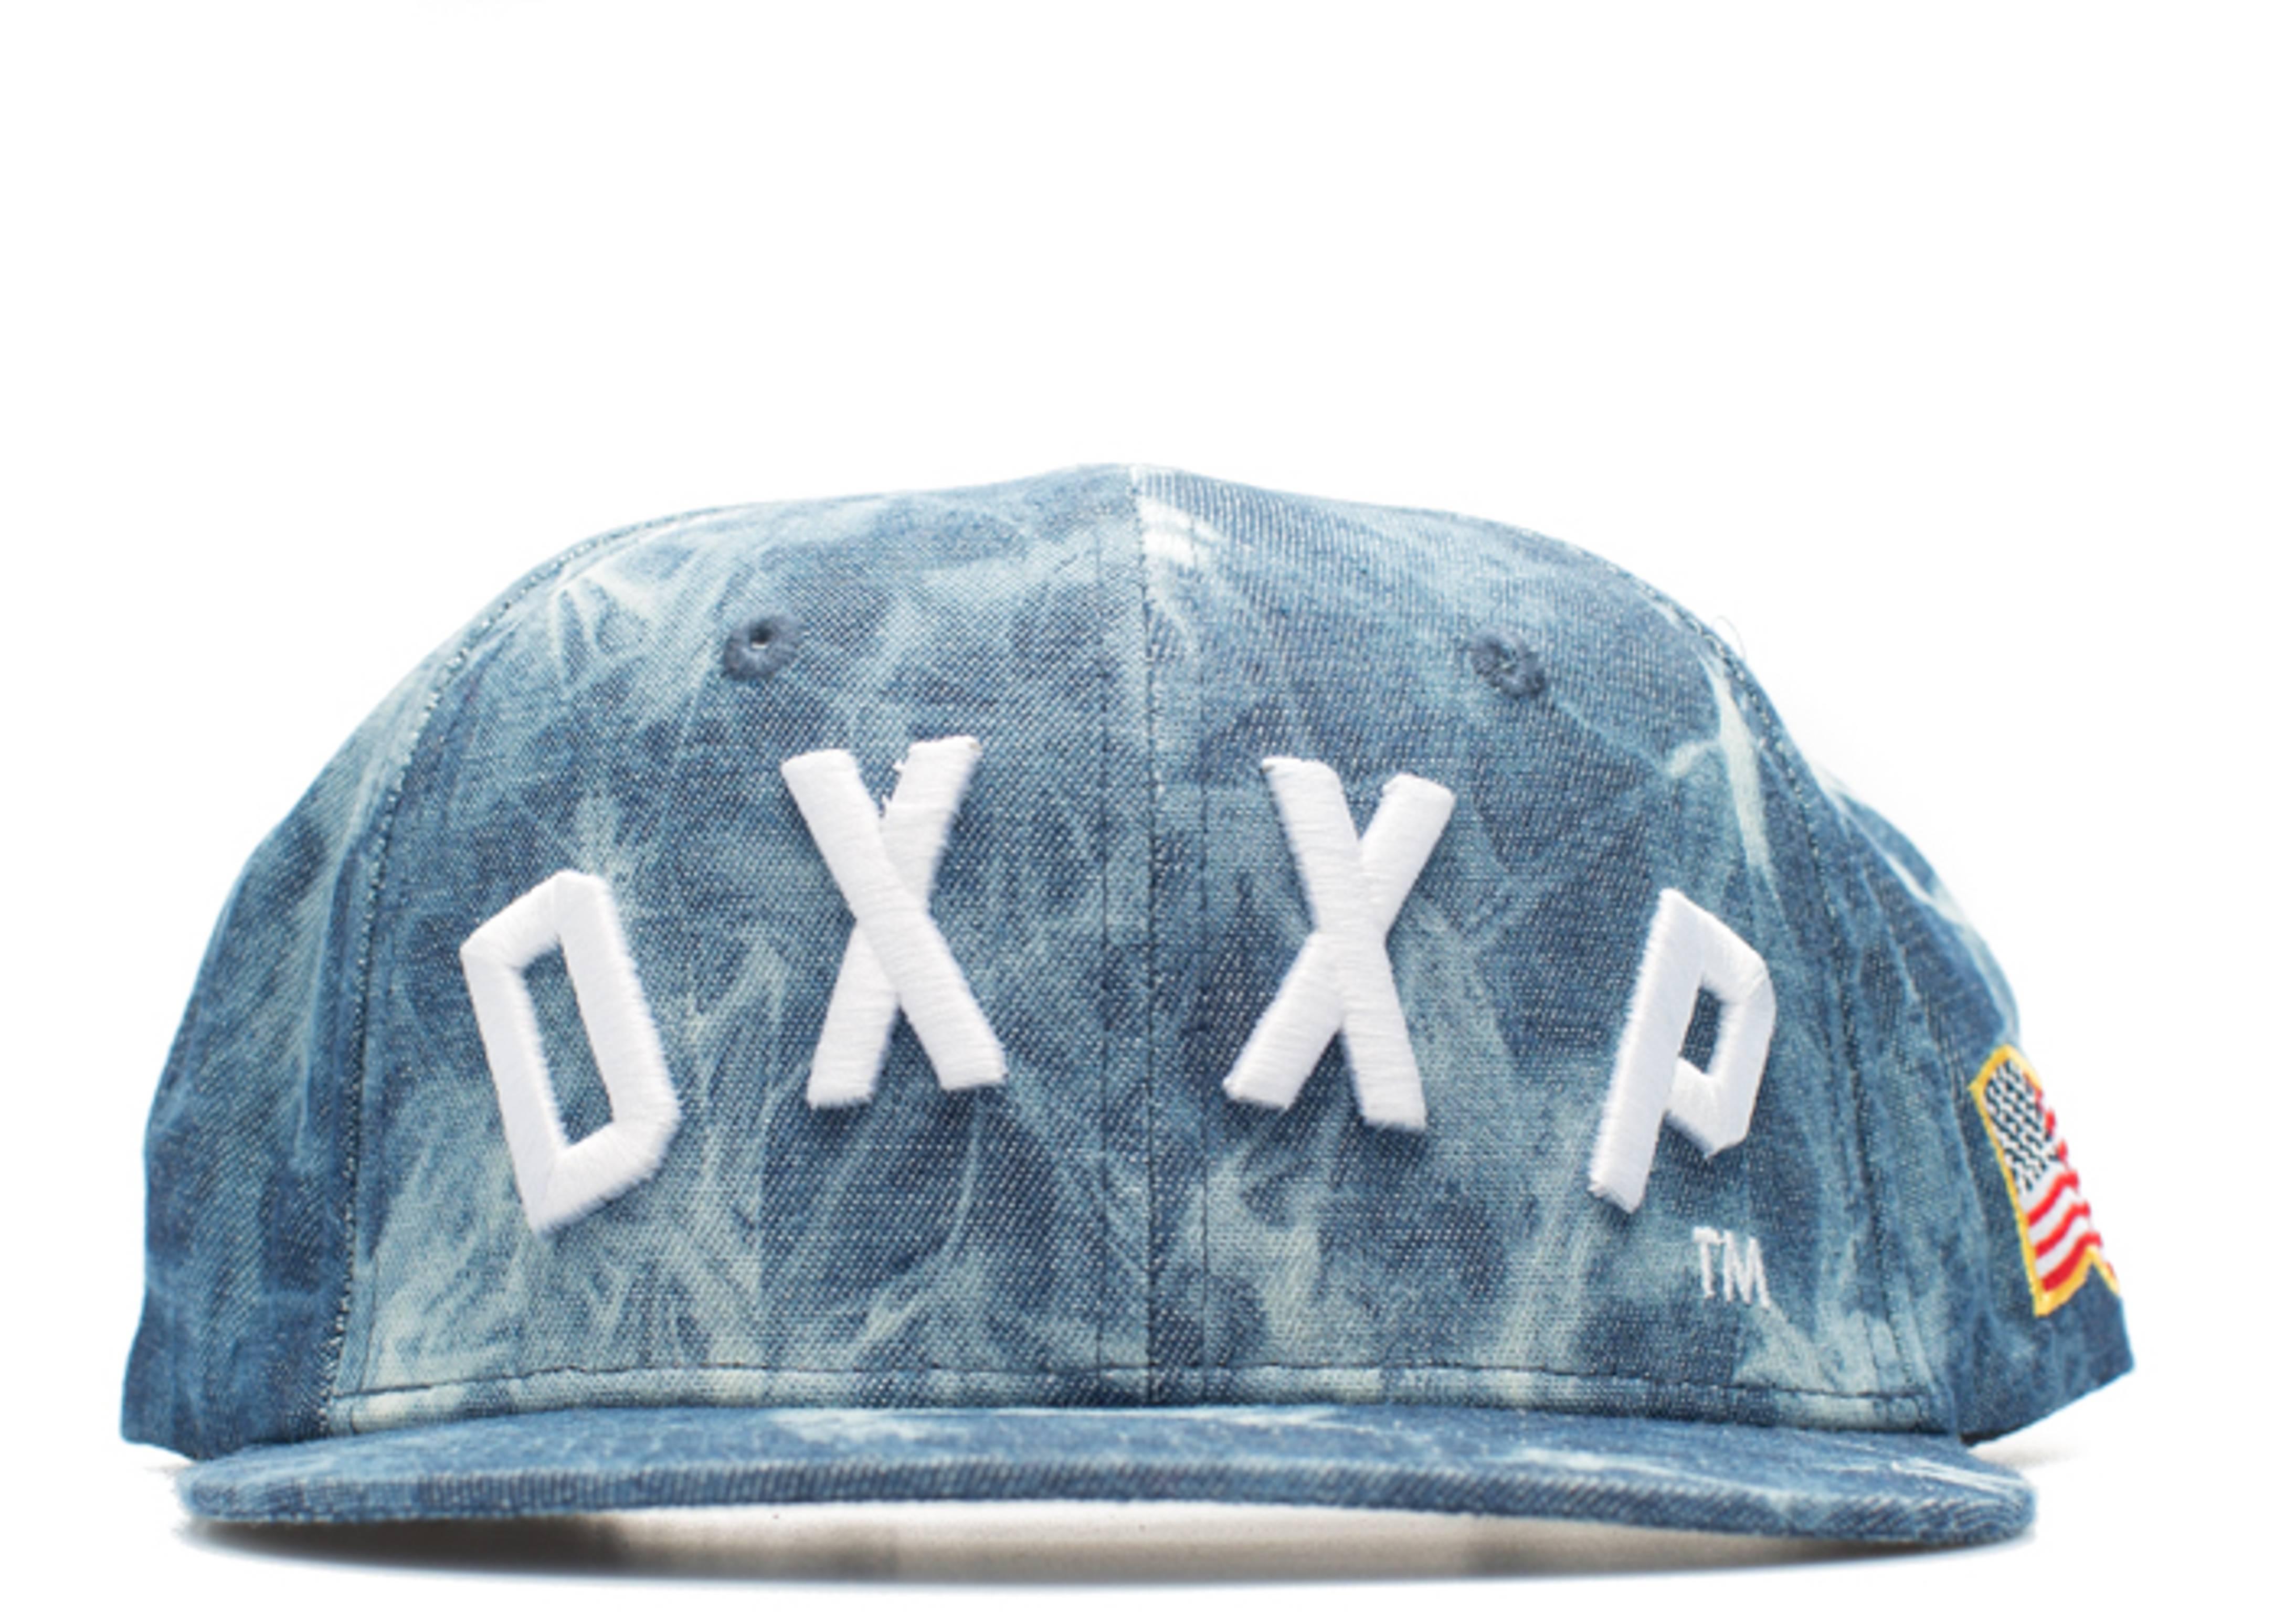 dxxp denim acid wash snap-back